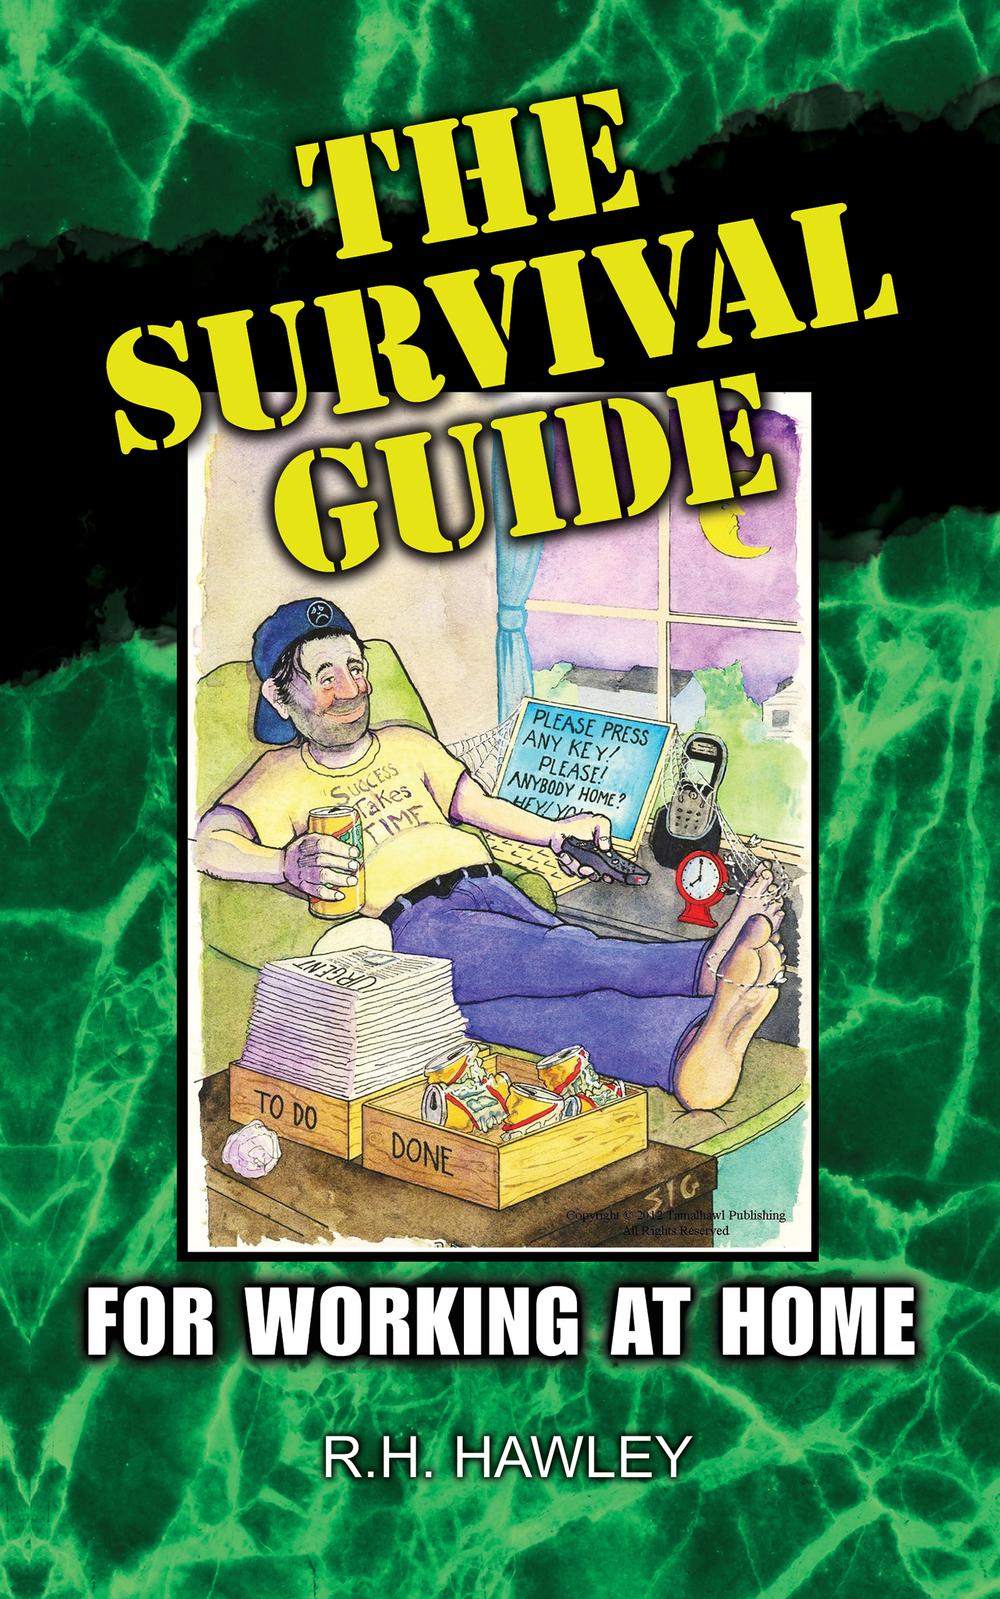 ISBN: 978-0-0615-83779-6 Price: $14.95